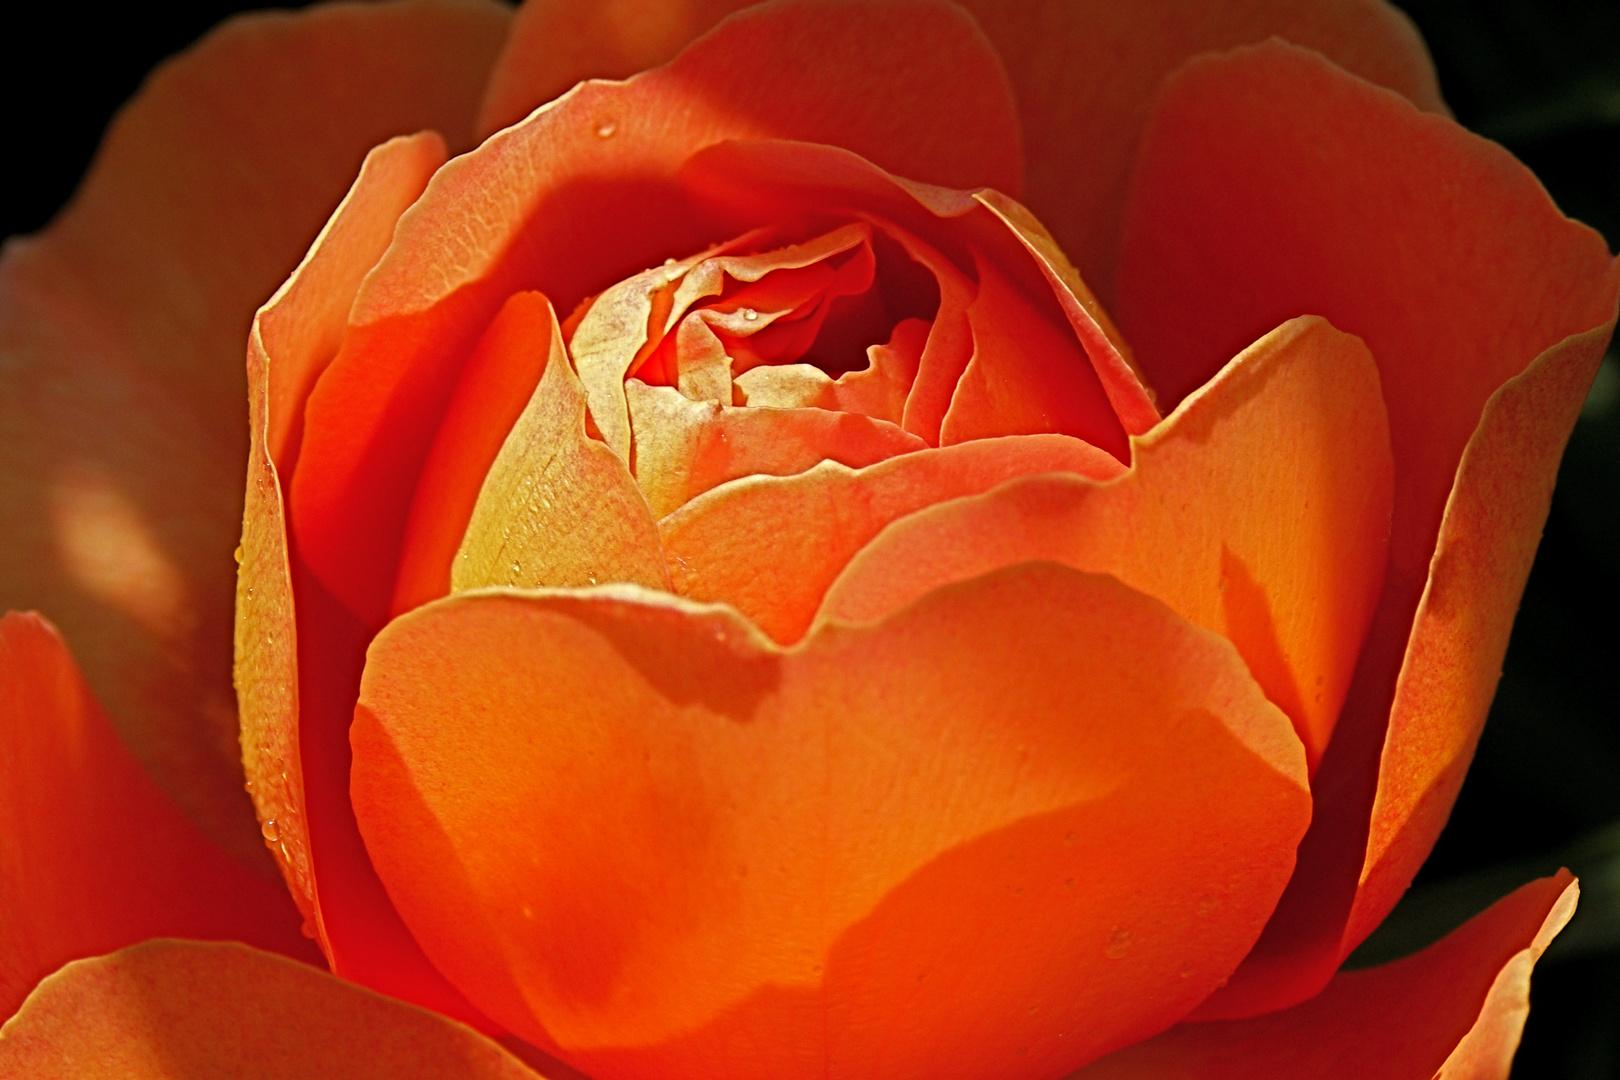 Sonne trifft Rose